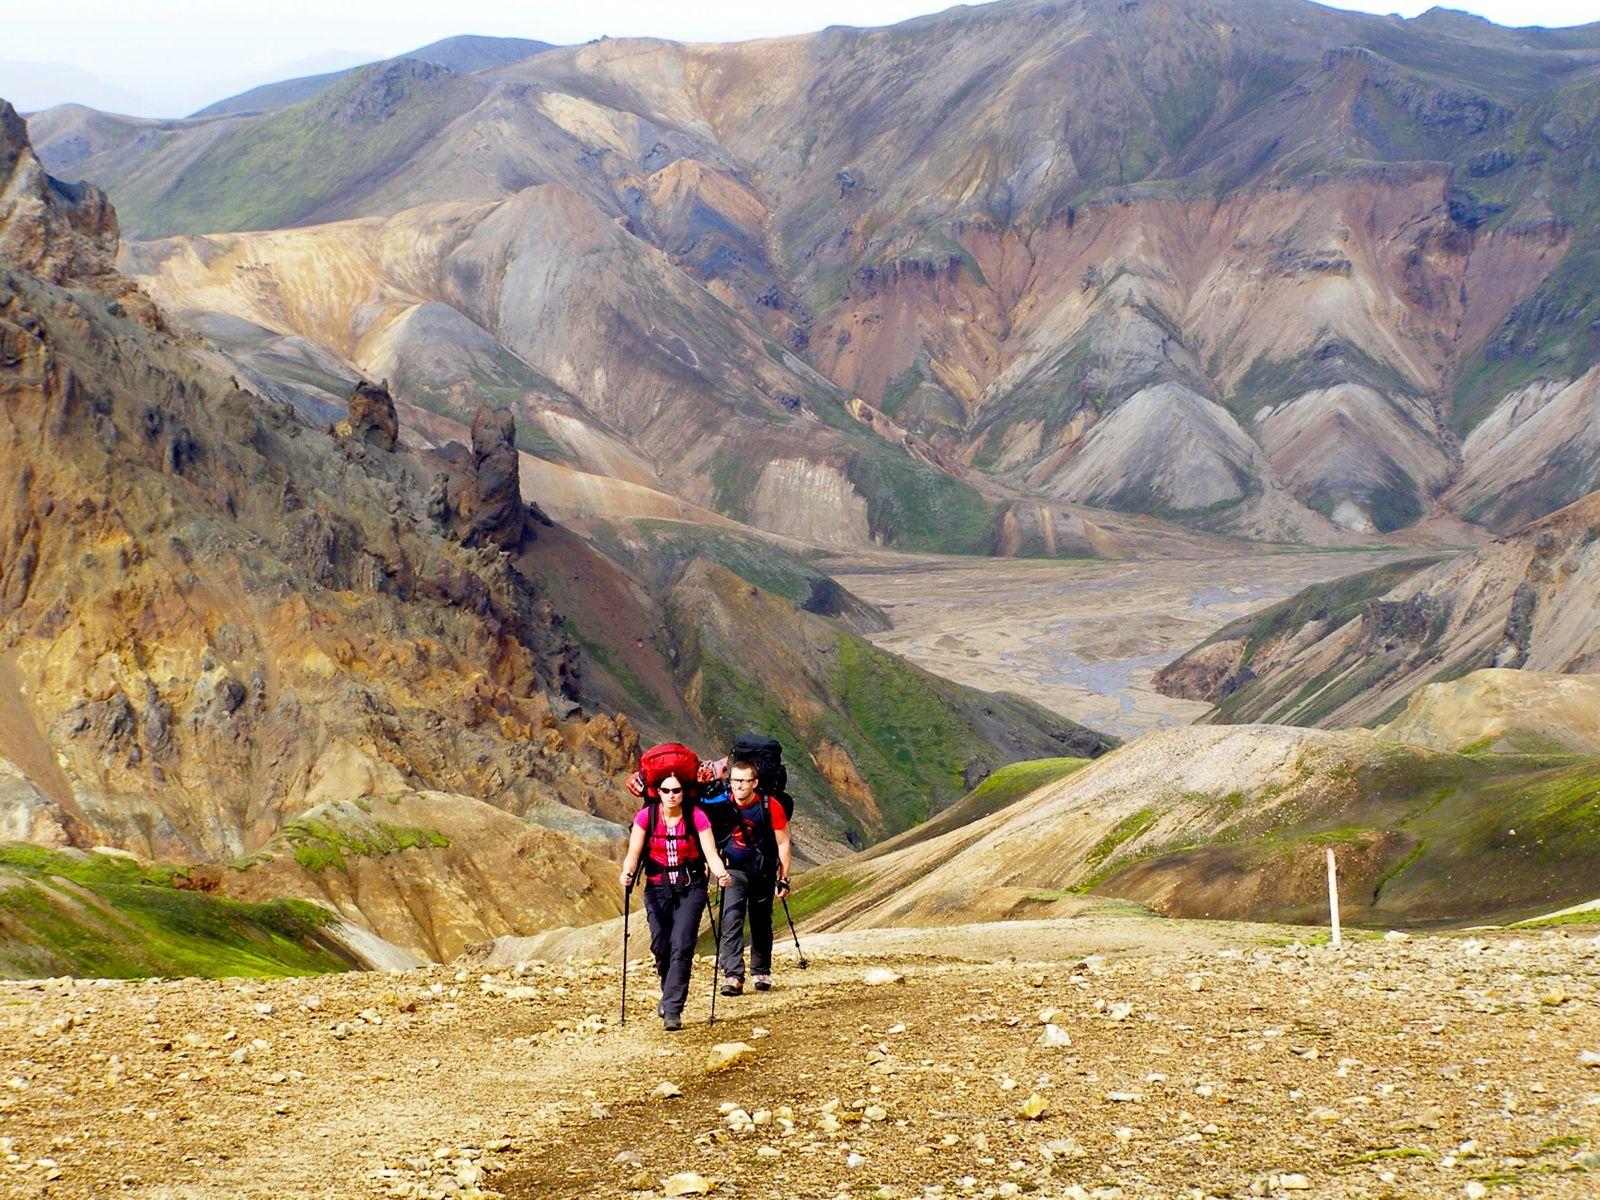 Trekking in Landmannalaugar, Iceland